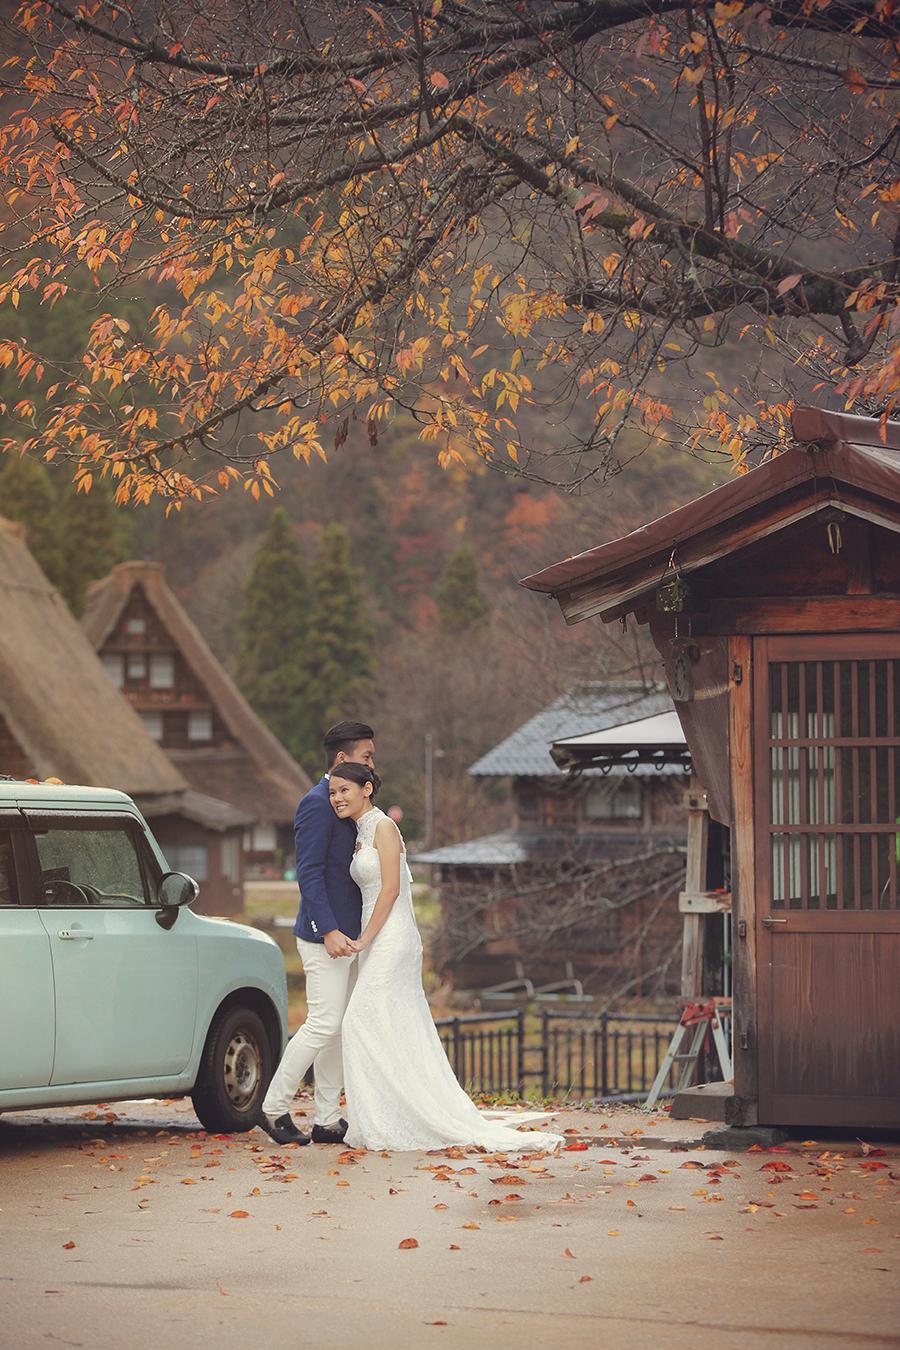 shirakawago japan . pre-wedding photography by kurt ahs . terry+zoey . 4266.jpg